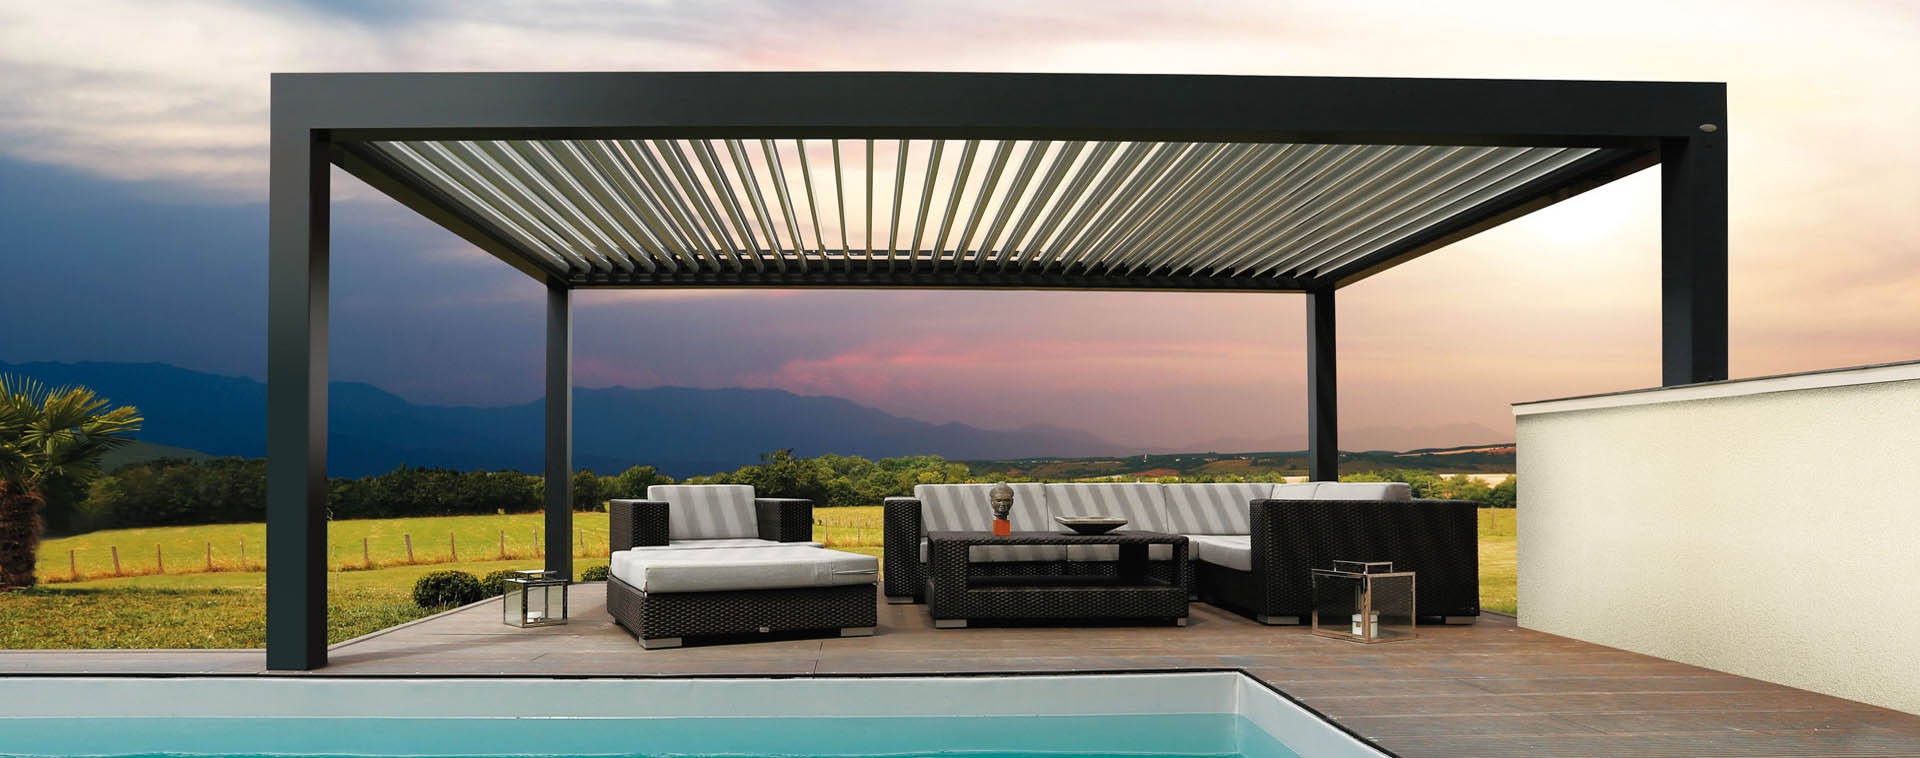 outdoor-concepts-proyectos-de-terrazas